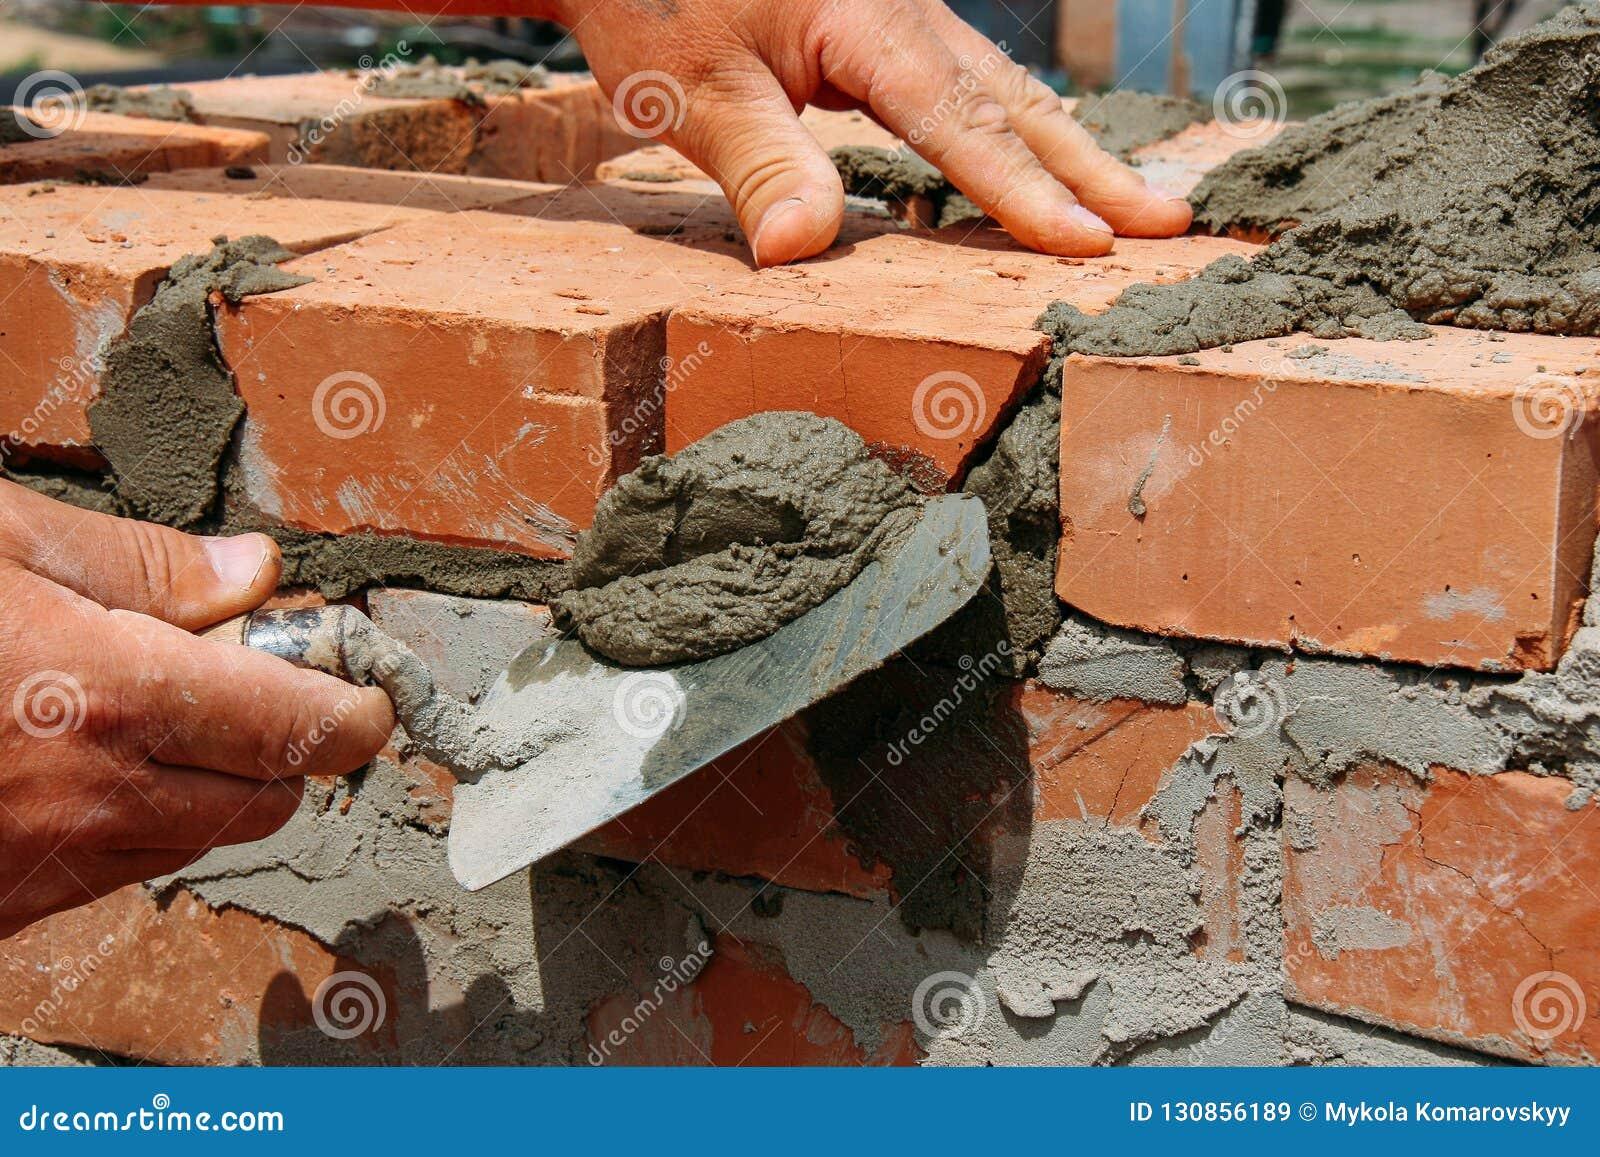 Bricklayer Installing Bricks Stock Image - Image of masonry